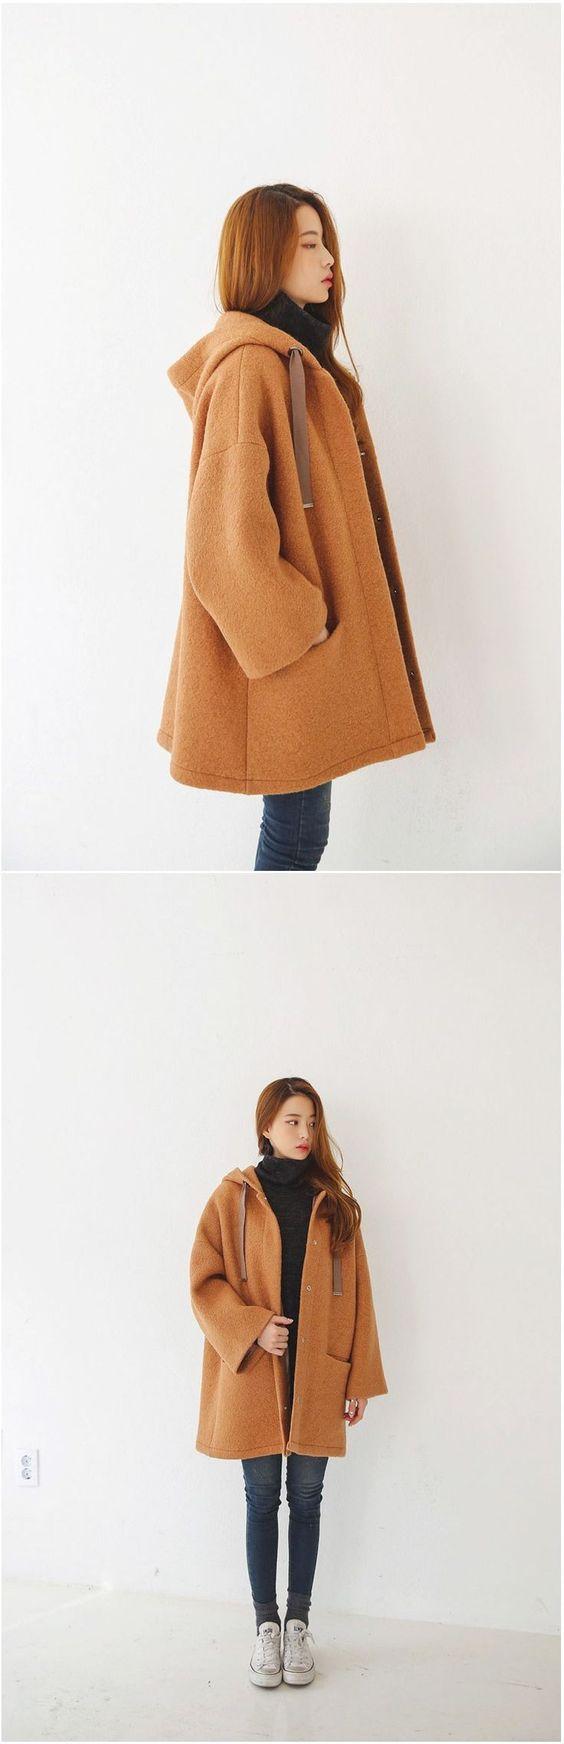 nice Womens Fashion Online   Korean Fashion Online Shopping by http://www.globalfashionista.xyz/korean-fashion-styles/womens-fashion-online-korean-fashion-online-shopping/